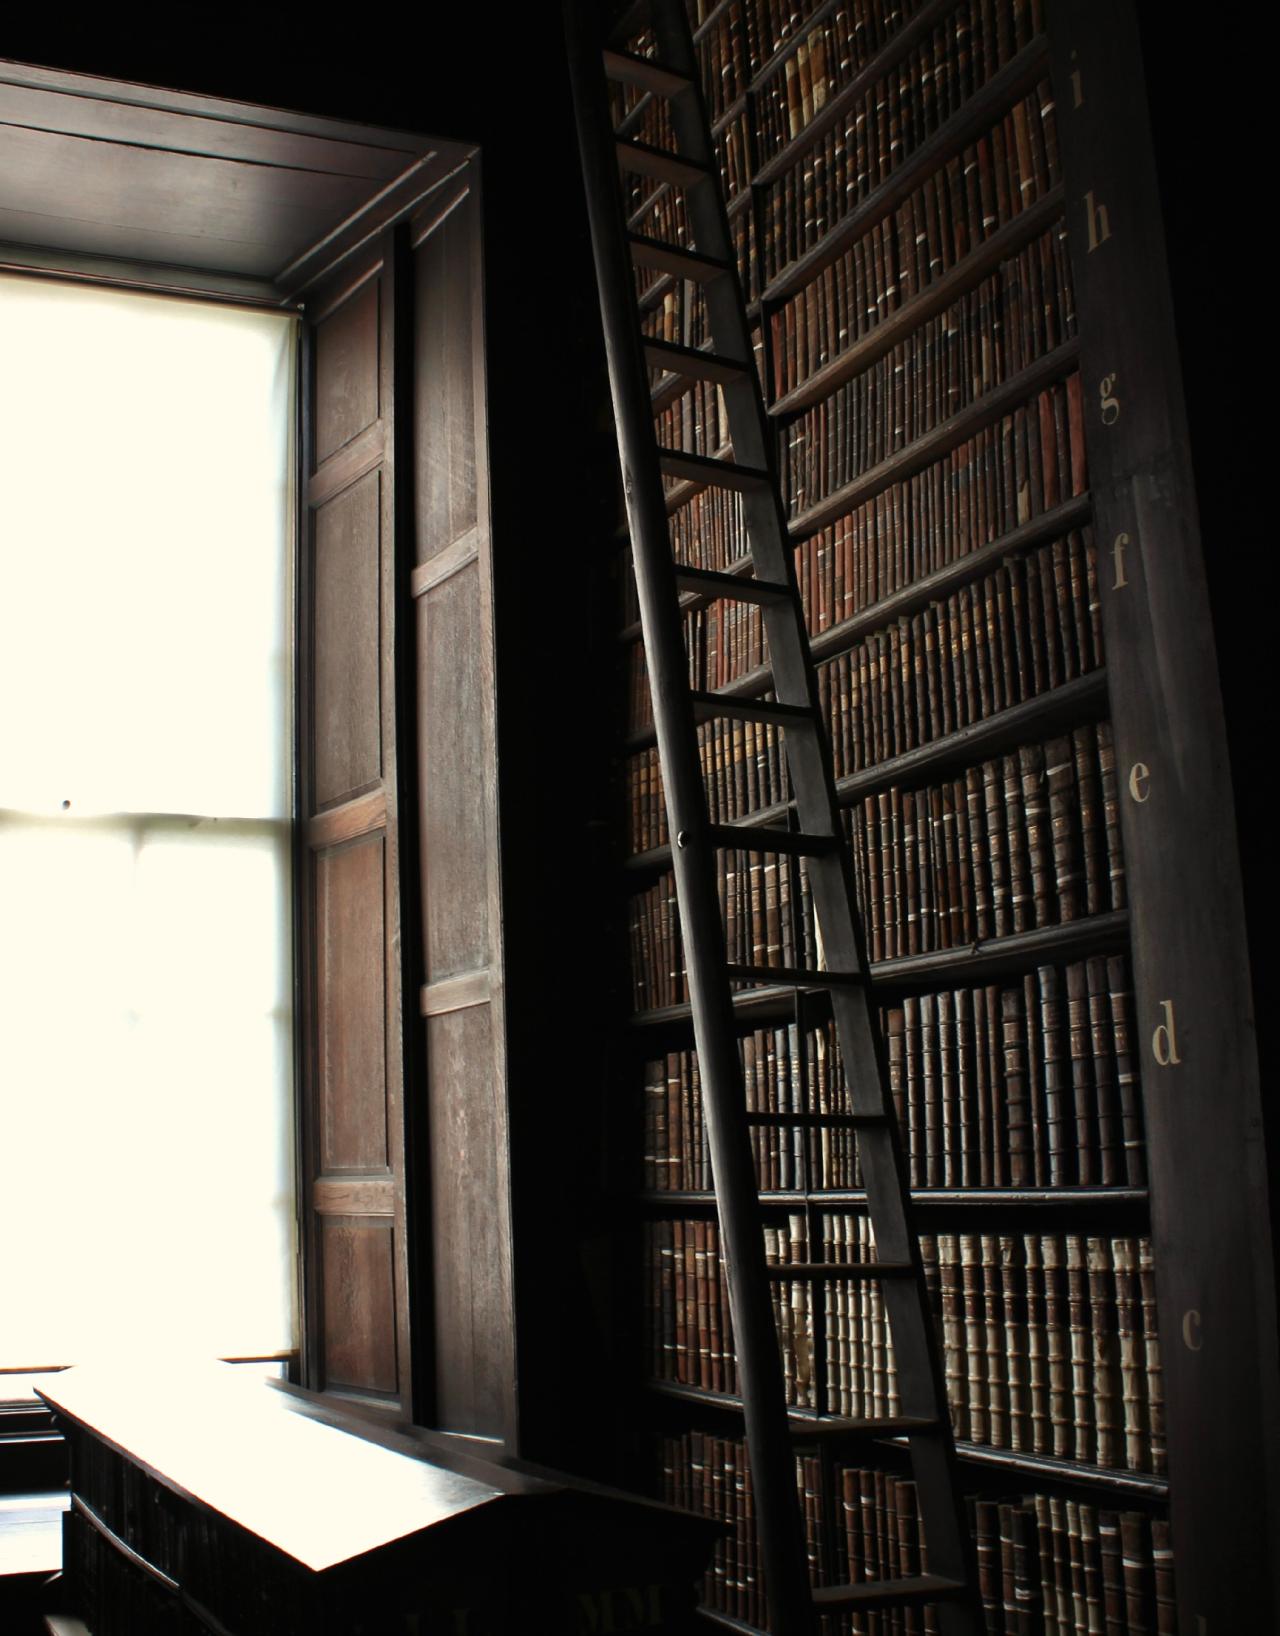 Olkd Study Room: >Sleep Is Good, He Said, And Books Are Better